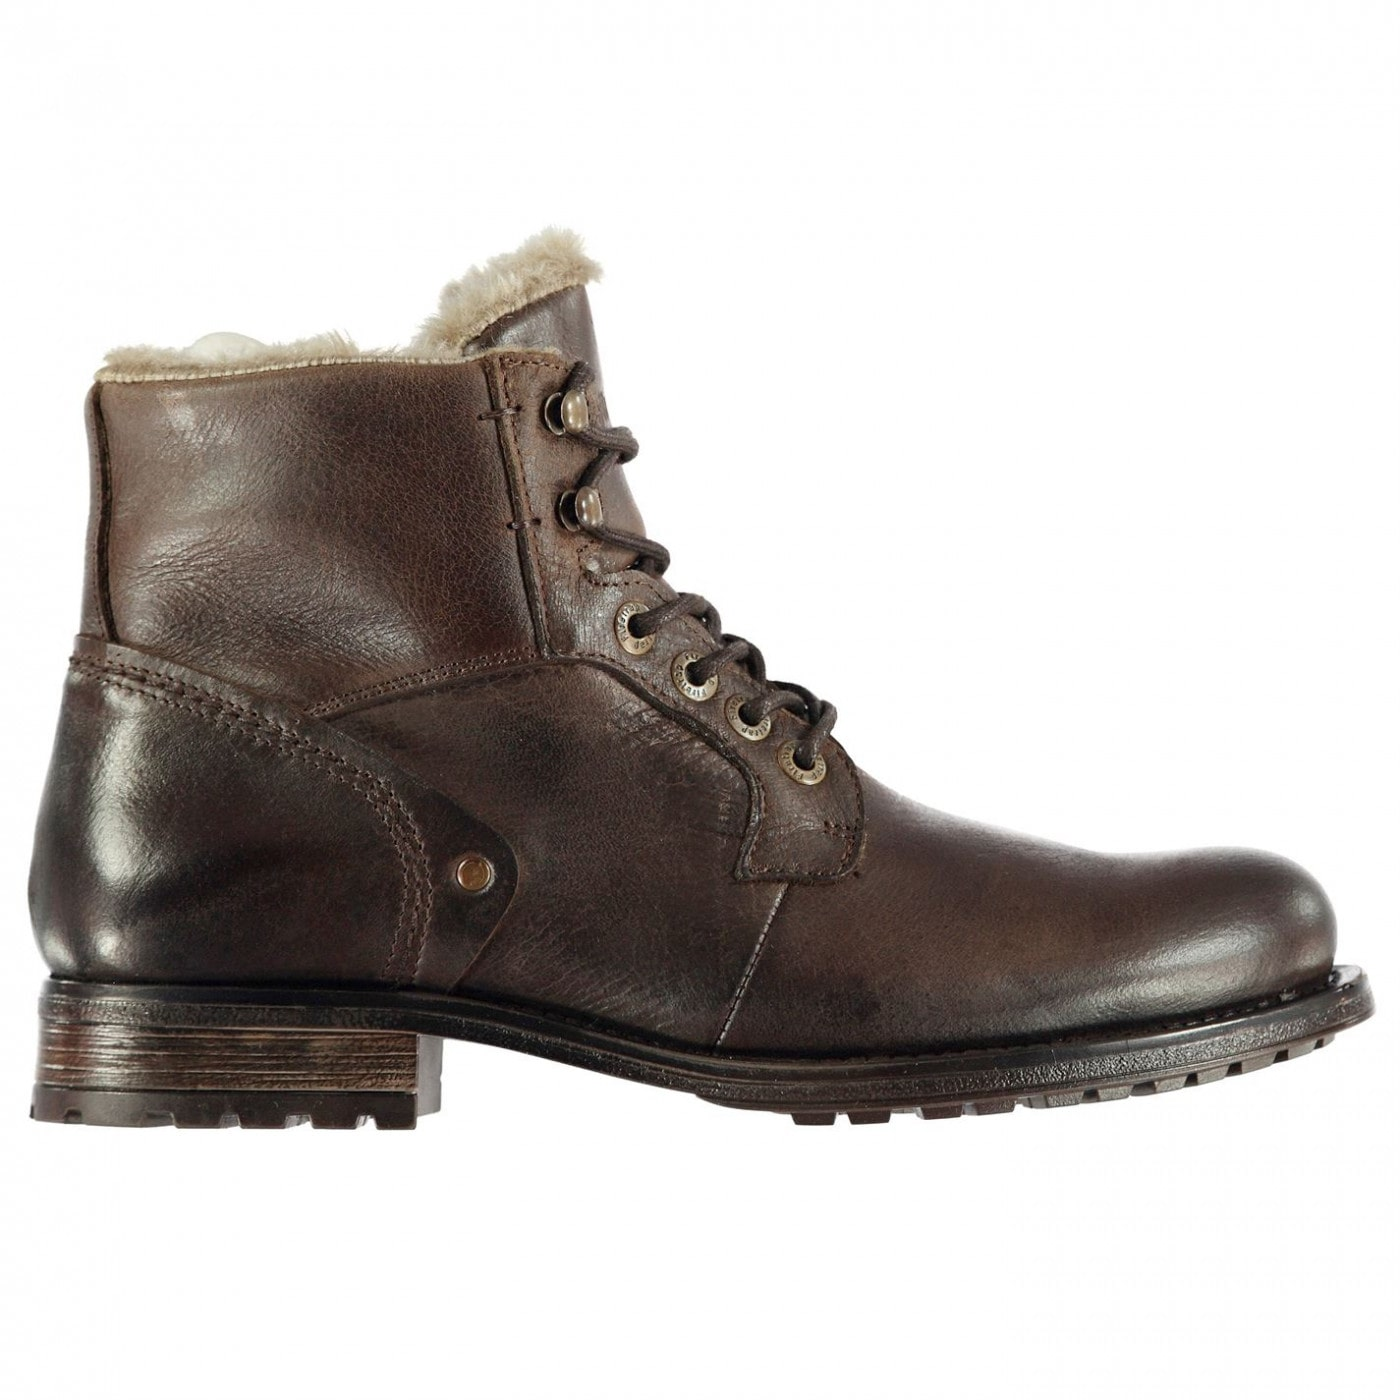 Firetrap Bodie Boots Mens